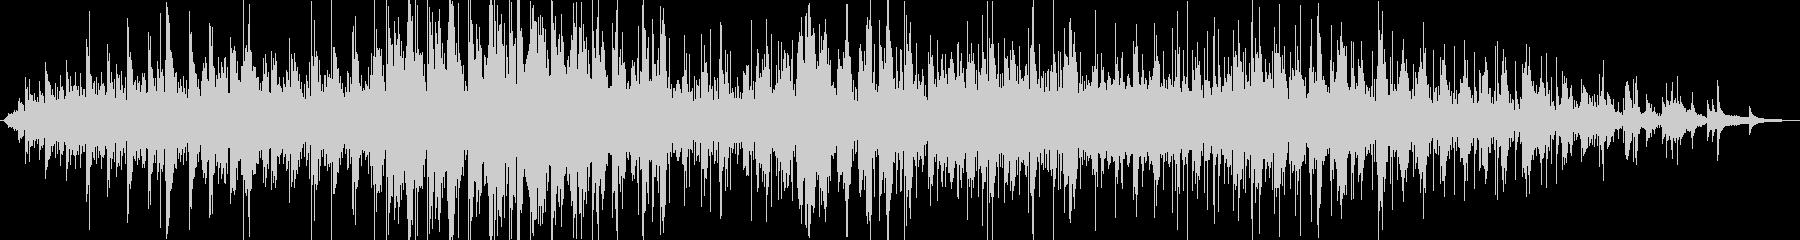 Cold Pianoの未再生の波形